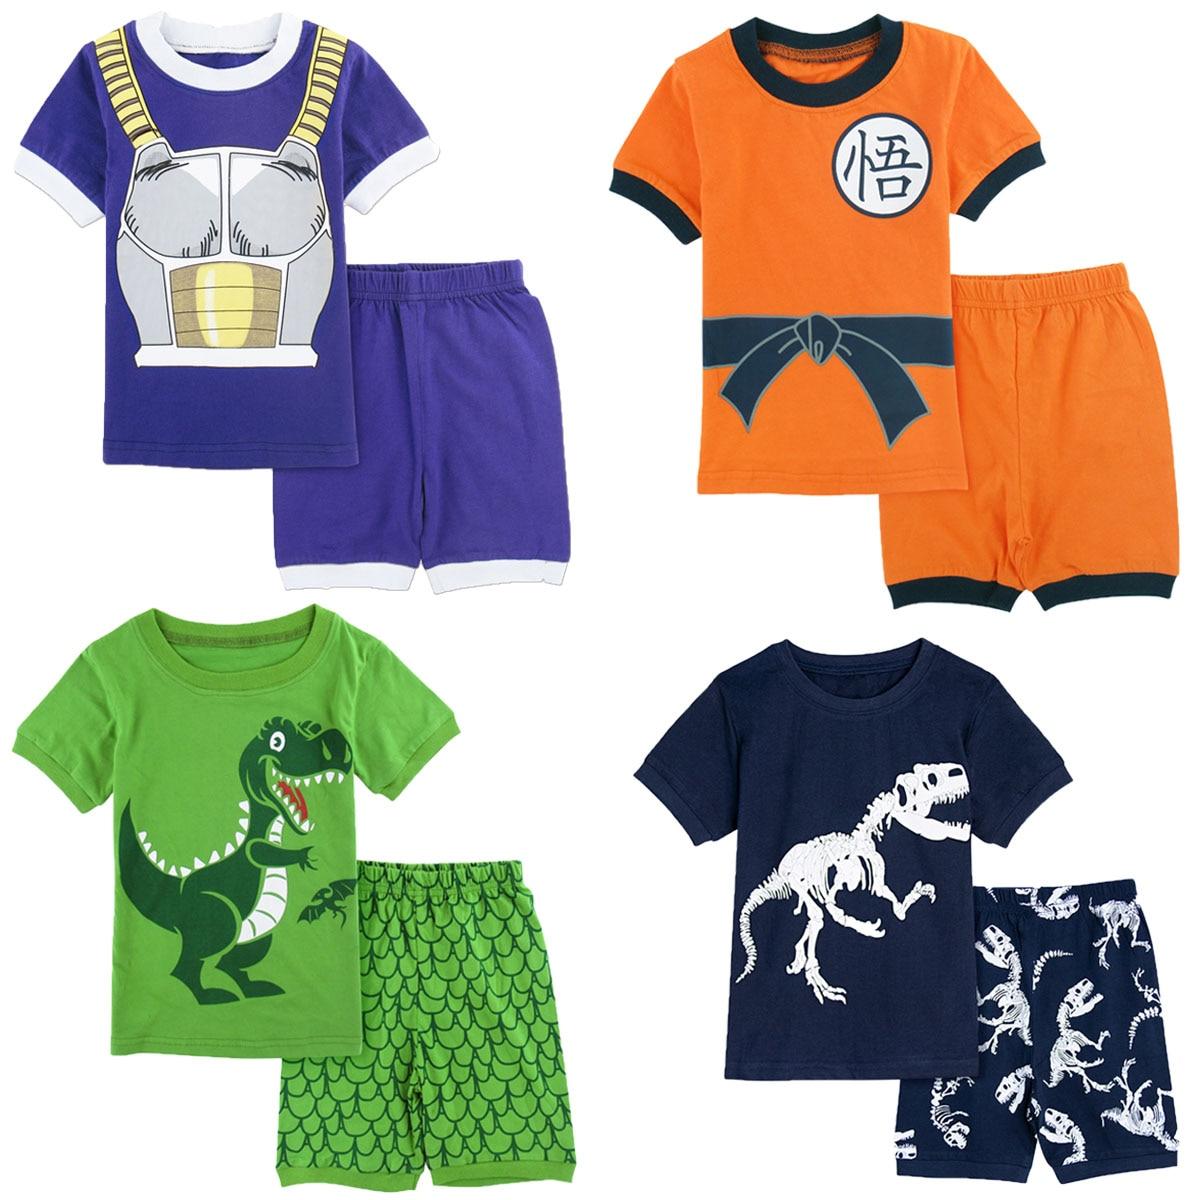 Kids Boys Dragon Ball Goku Vegeta Dinosaur Pajamas Set Toddler Shark Pirate Ship Truck Sleepwear Children Cartoon Nightwear 2PCS